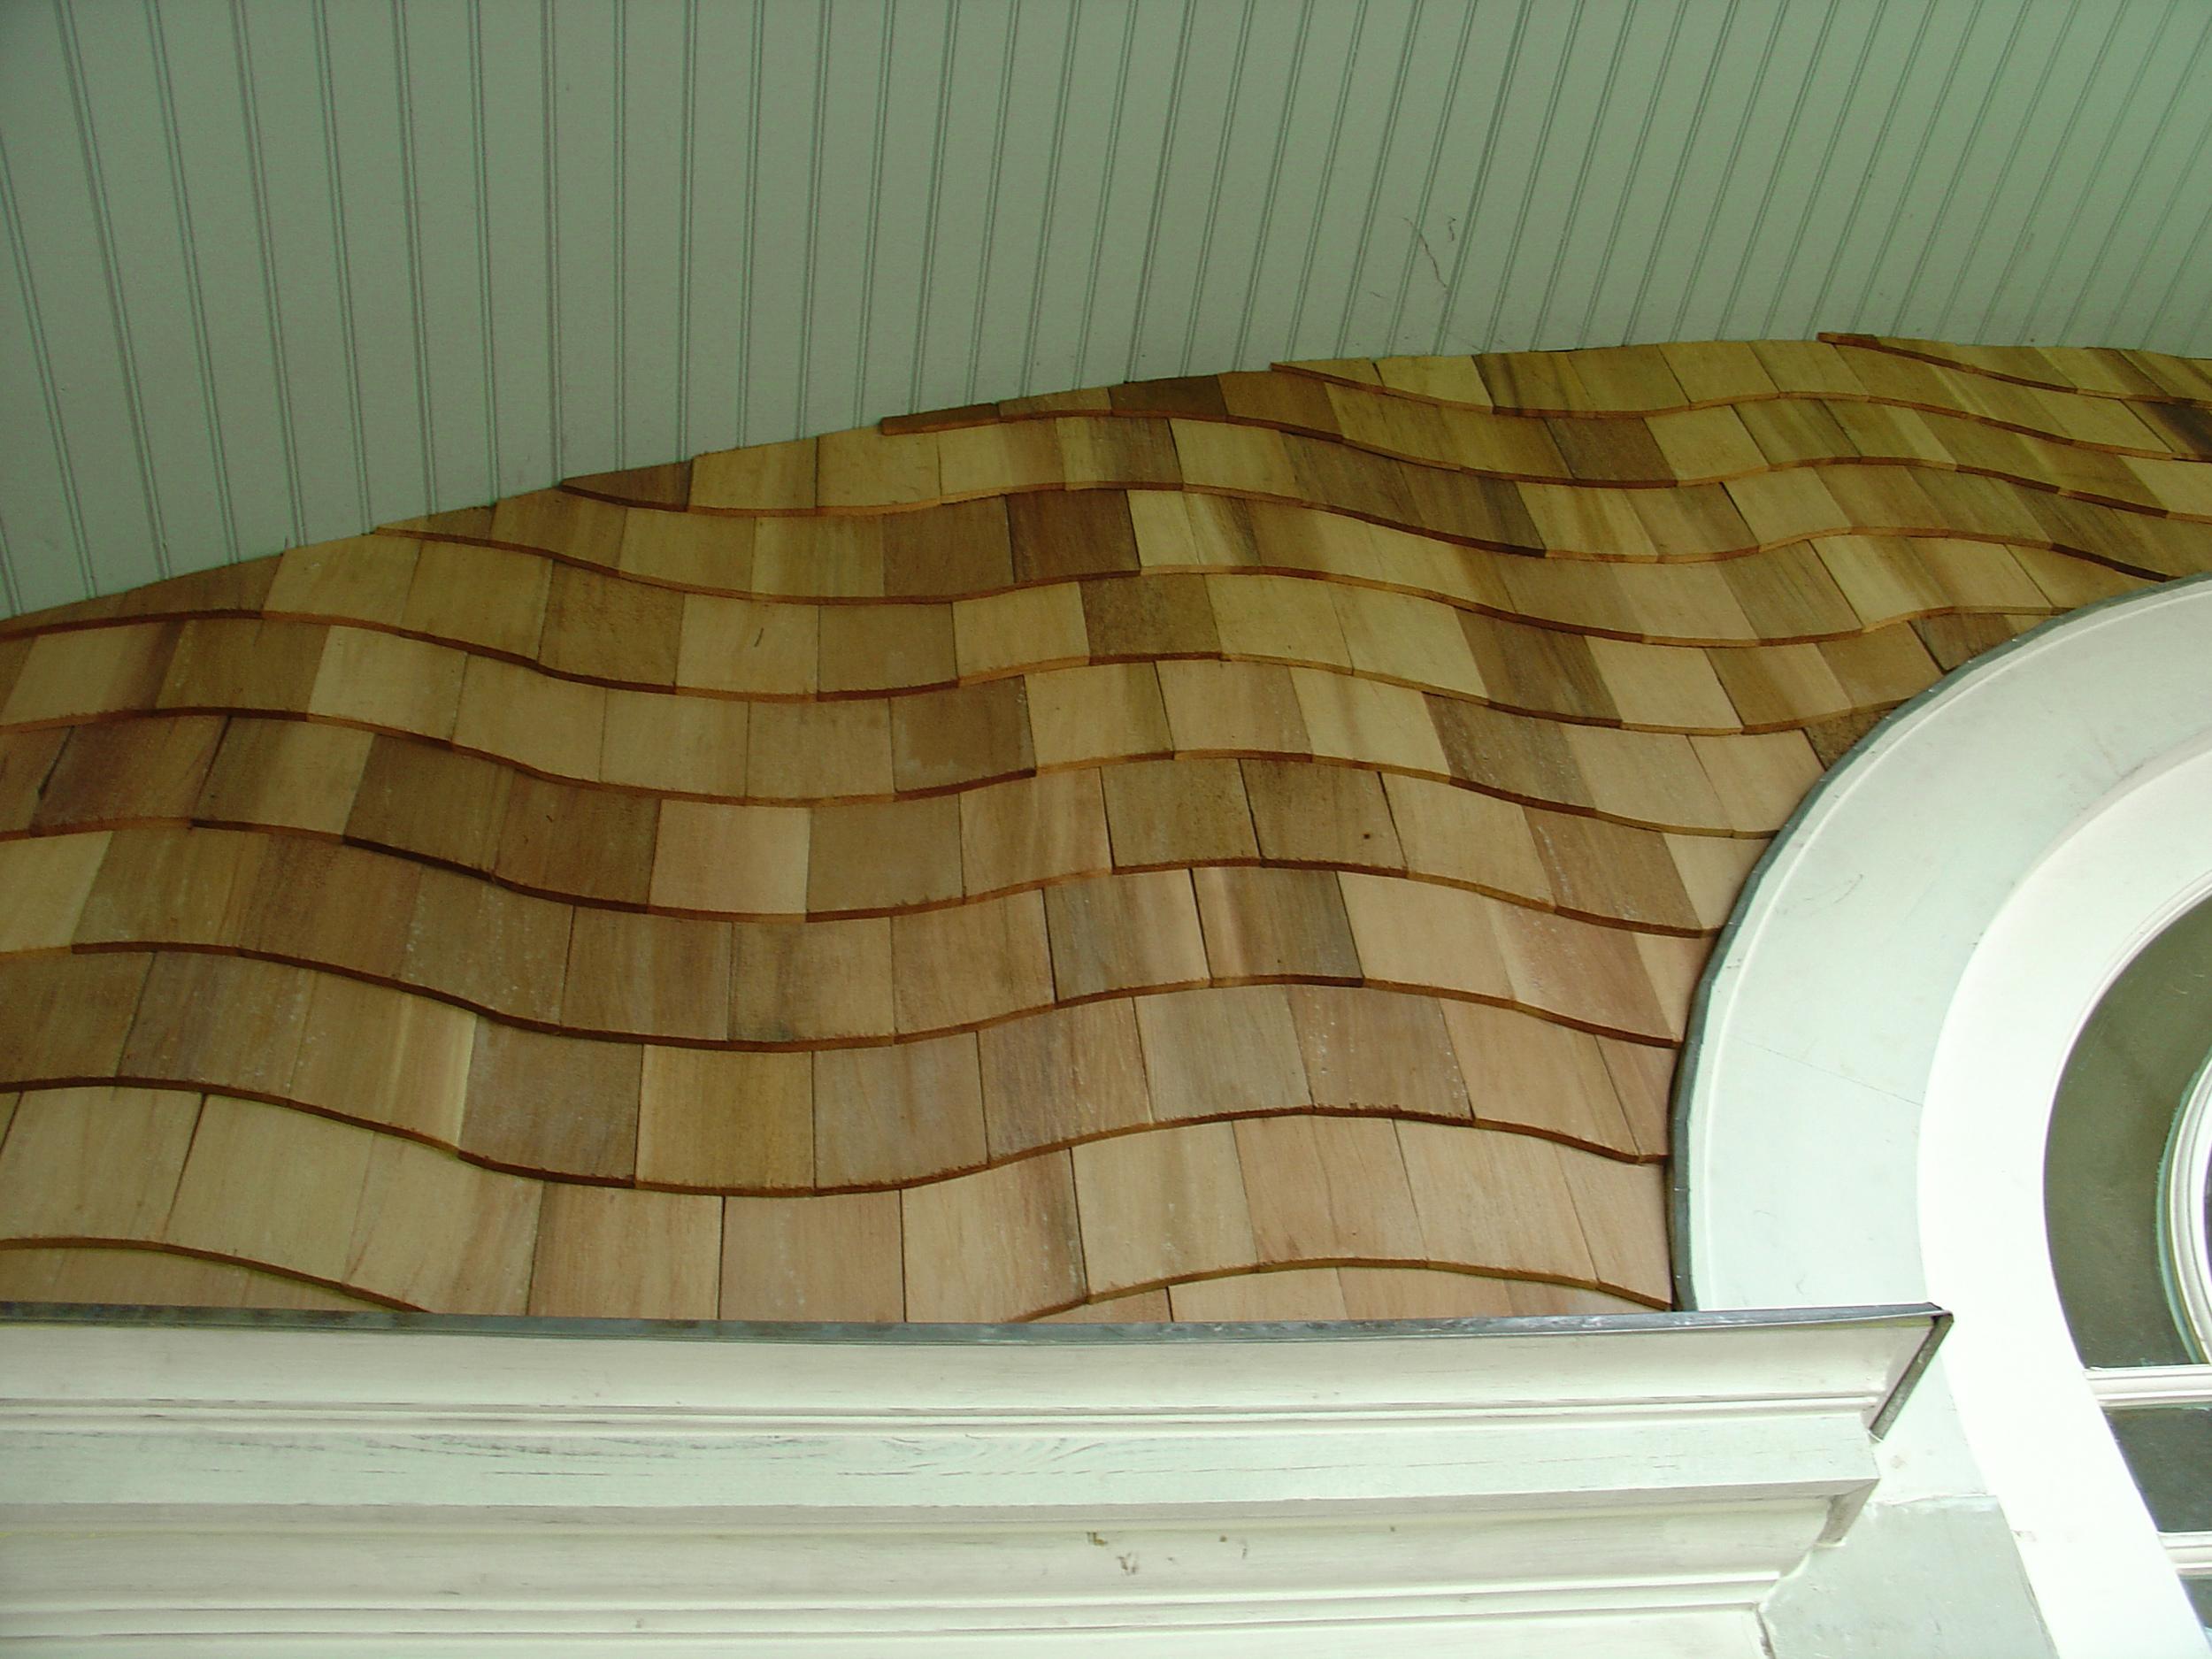 Wavy Patterned Wall Detail.jpg